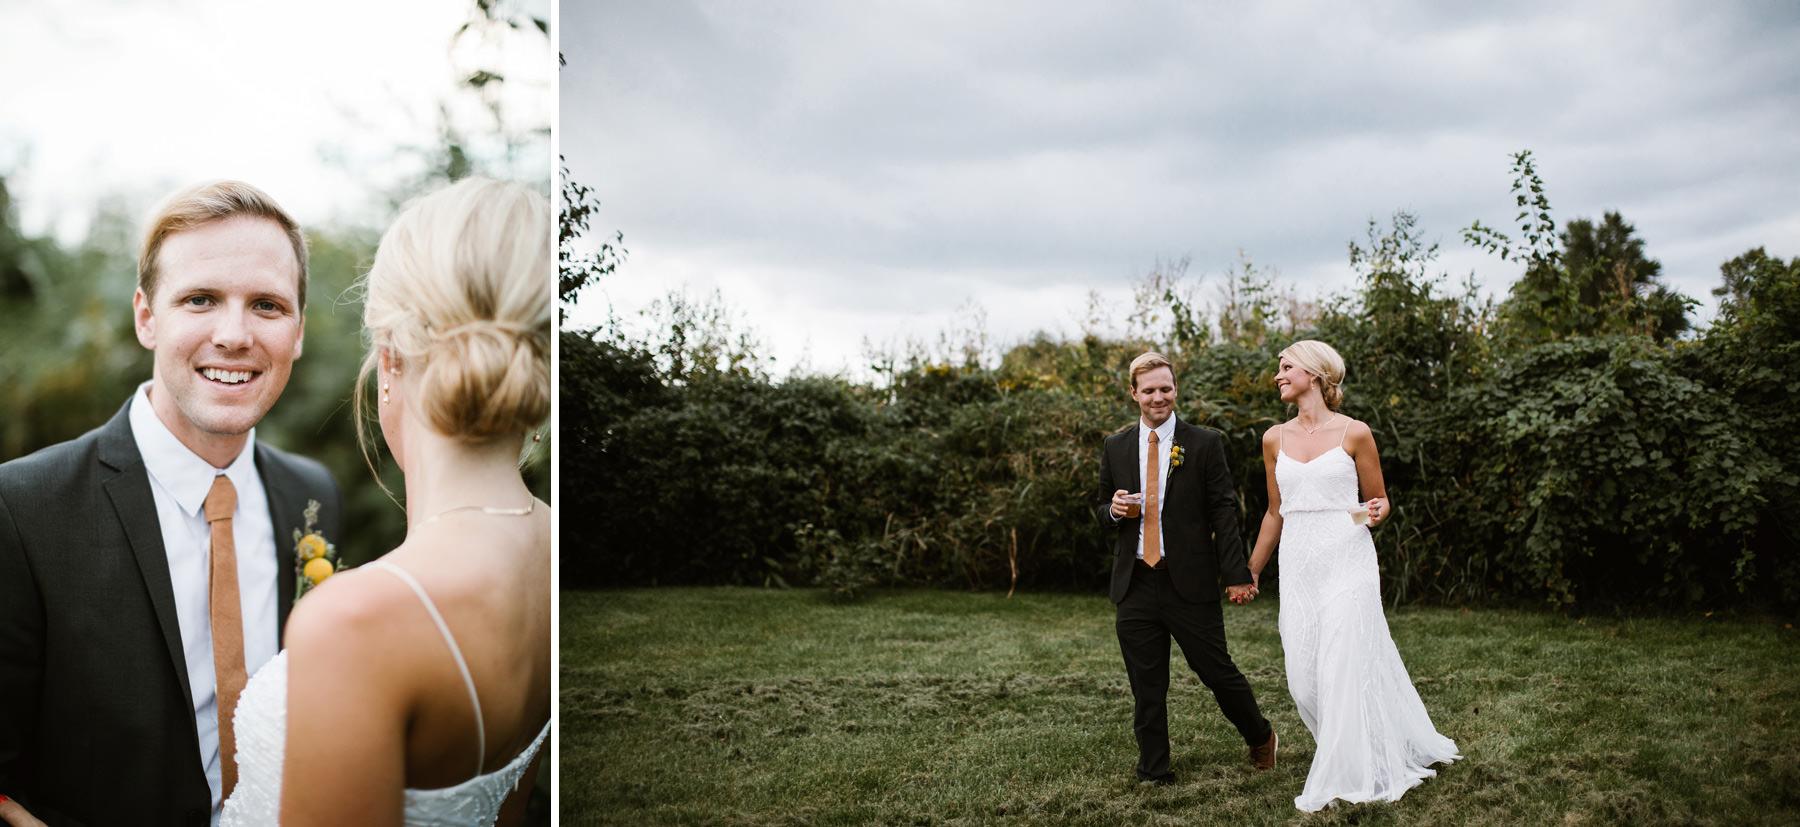 Alldredge Orchard Kansas City_Kindling Wedding Photography BLOG 60.JPG